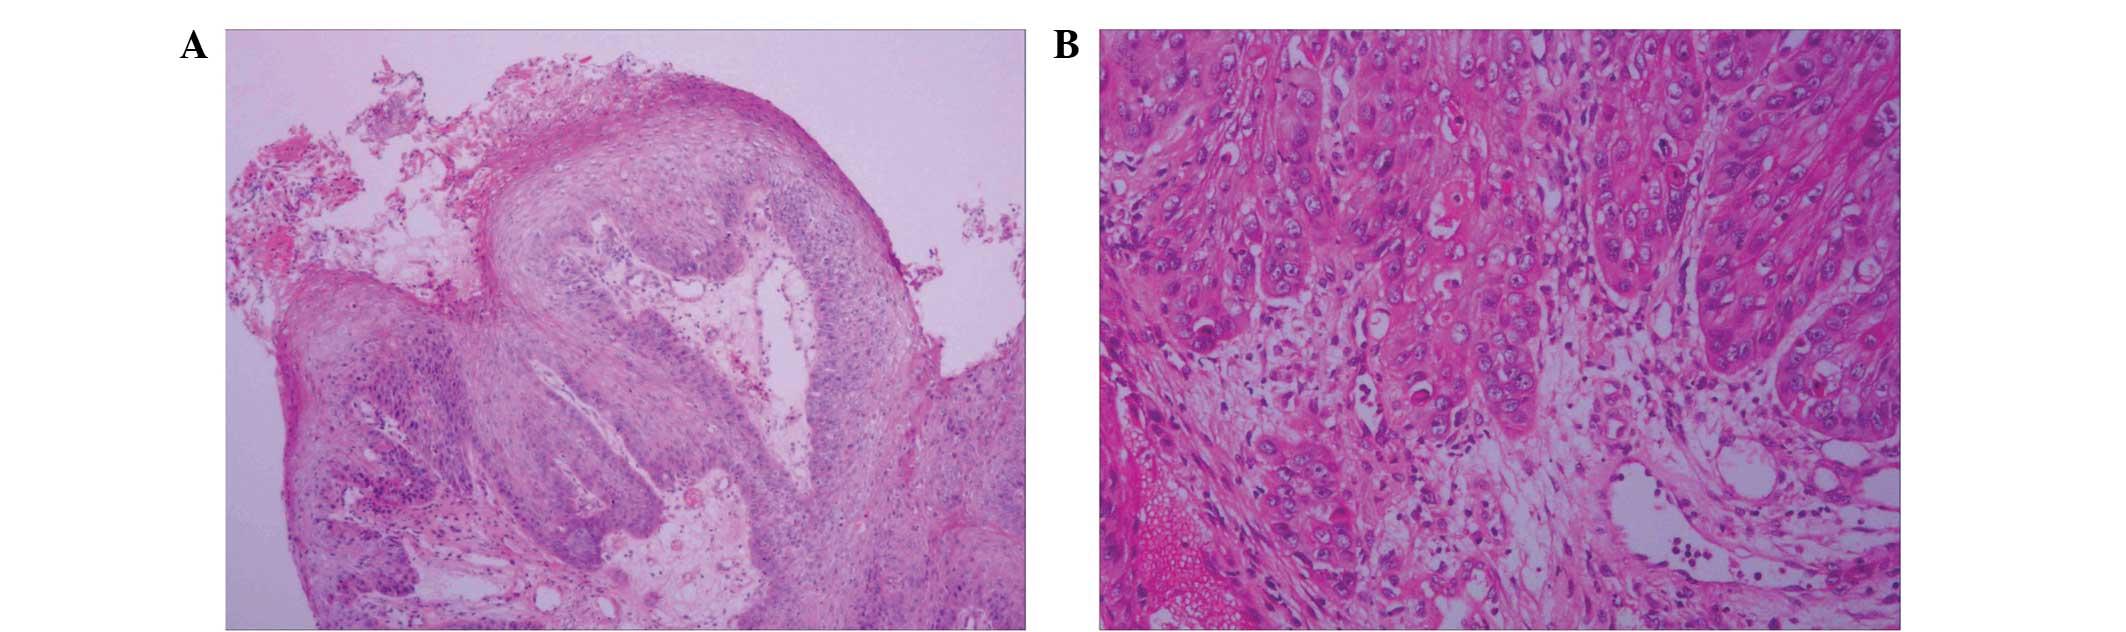 cancer urinar simptome hpv wart progression